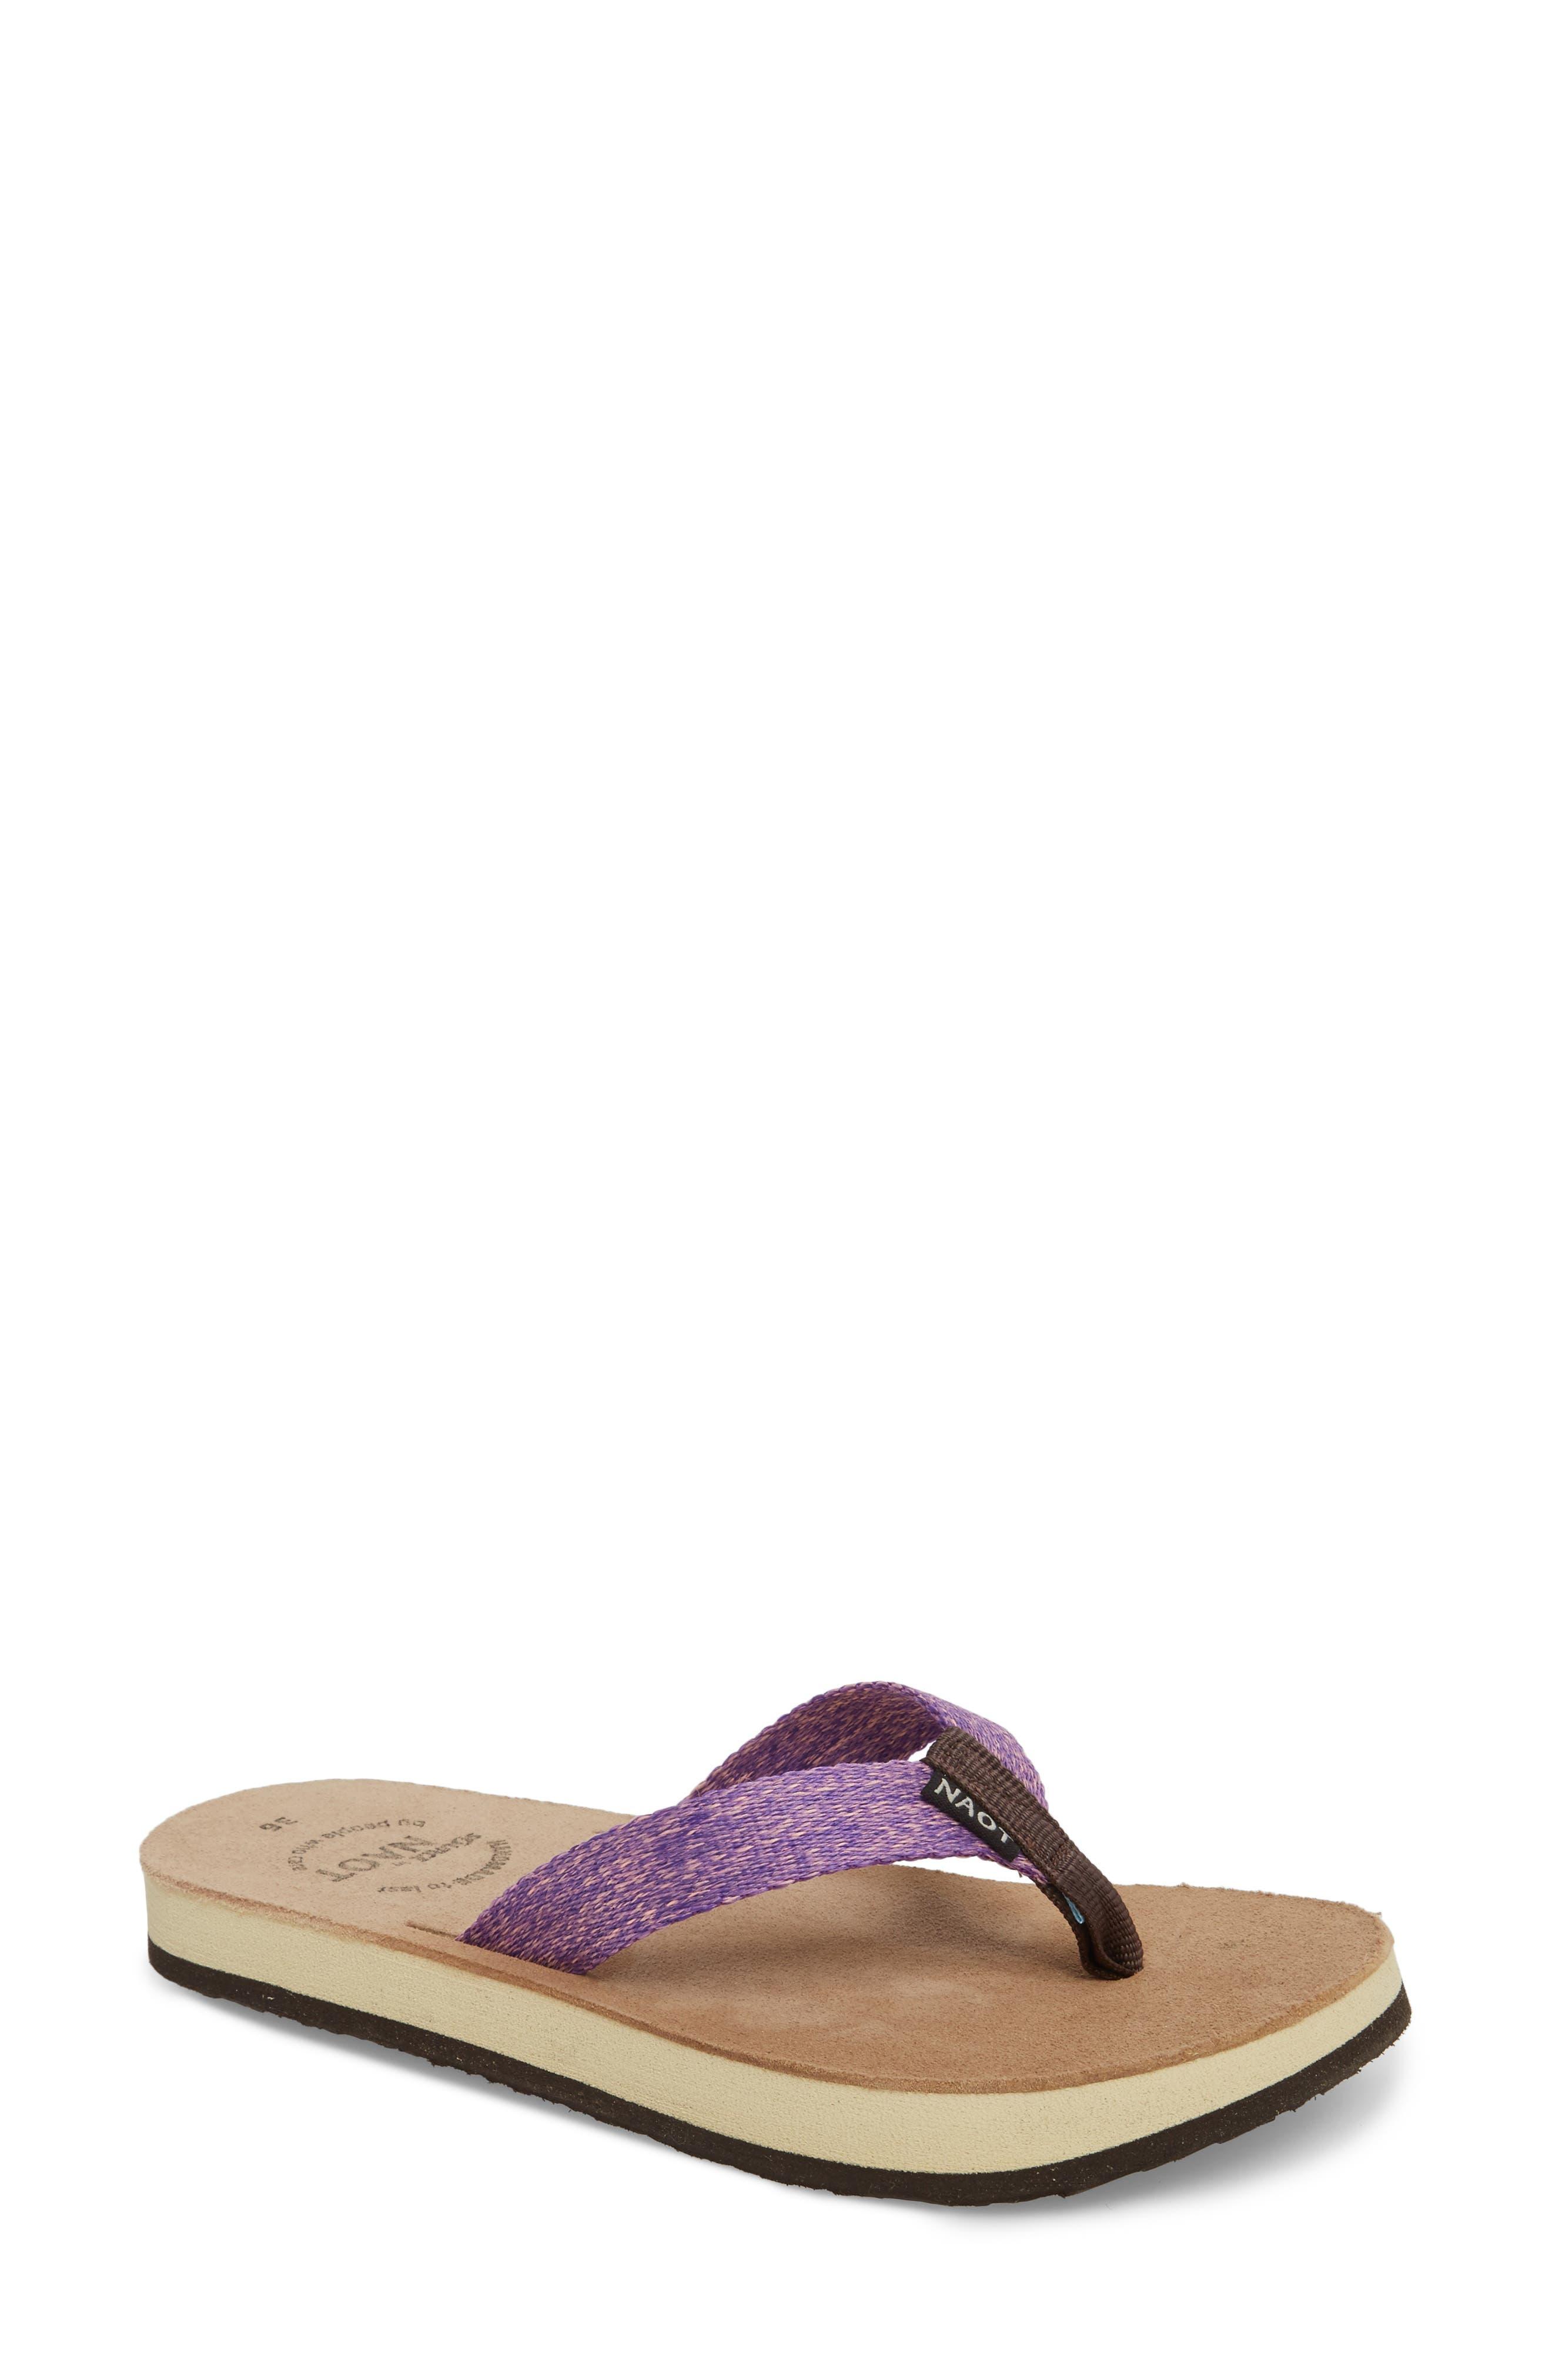 Island Flip Flop,                             Main thumbnail 1, color,                             Purple Lilac Fabric